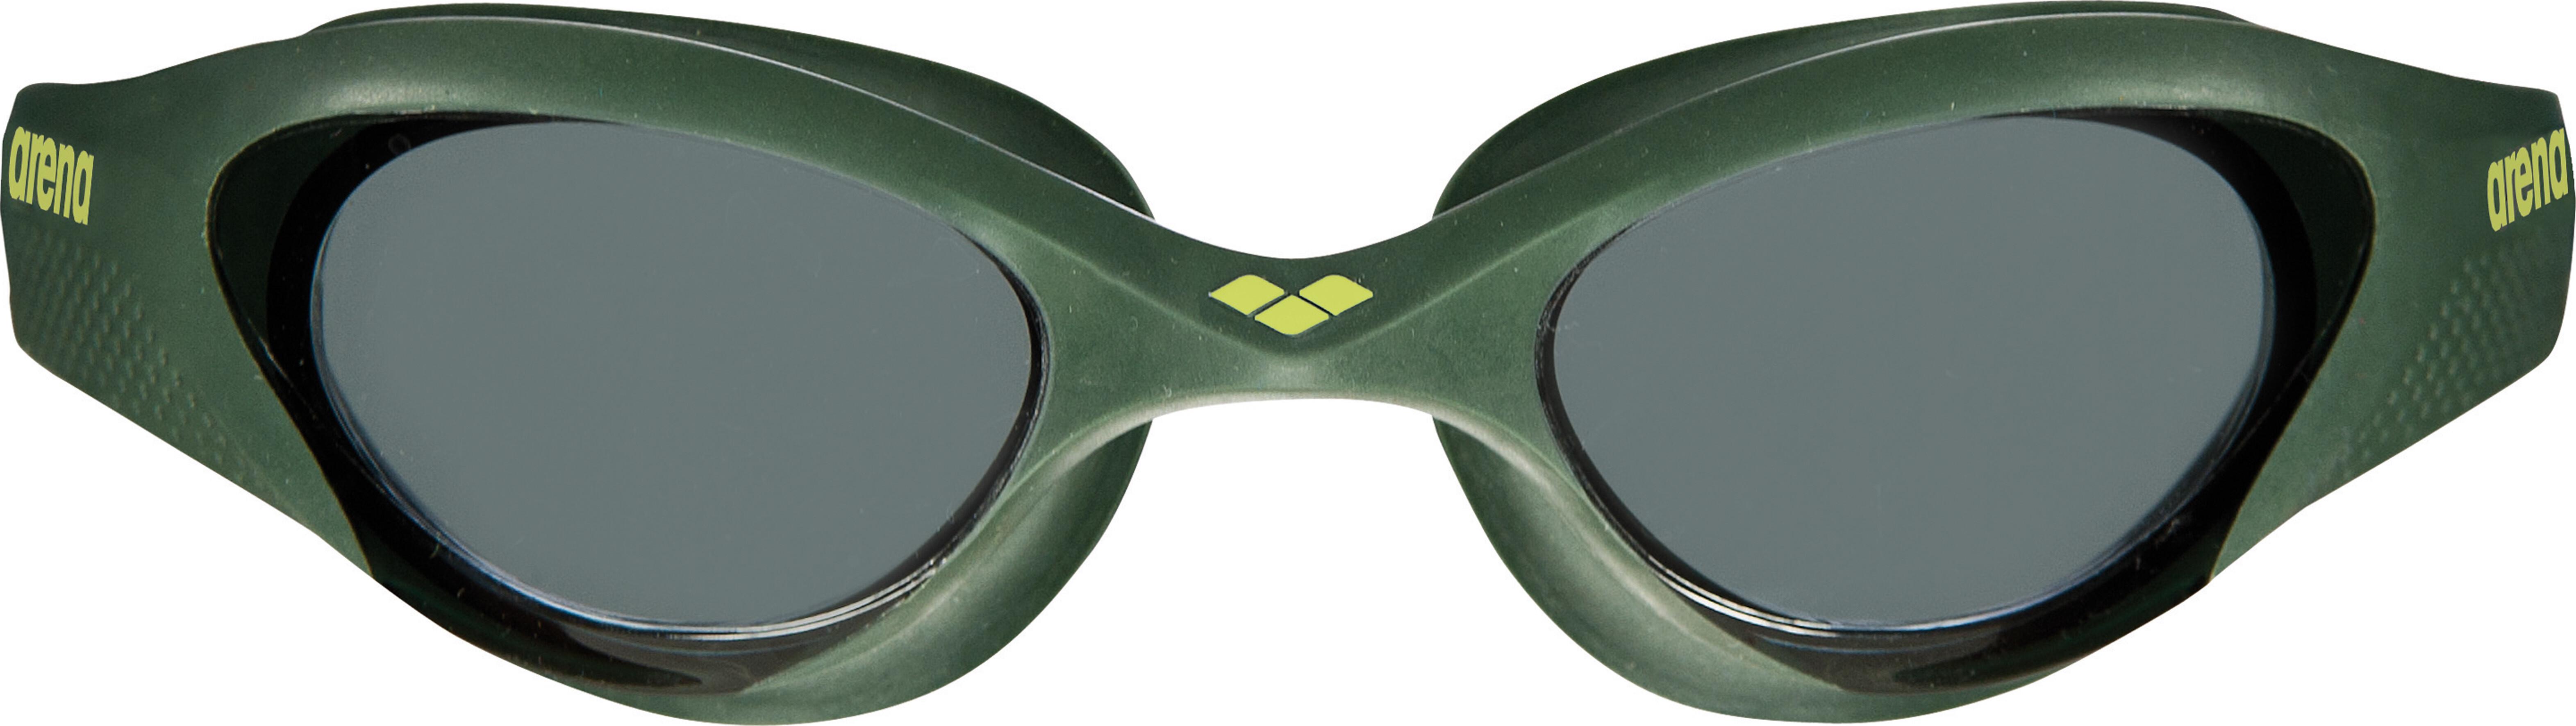 eda0a08a4 arena The One Svømmebriller, smoke-deep green-black